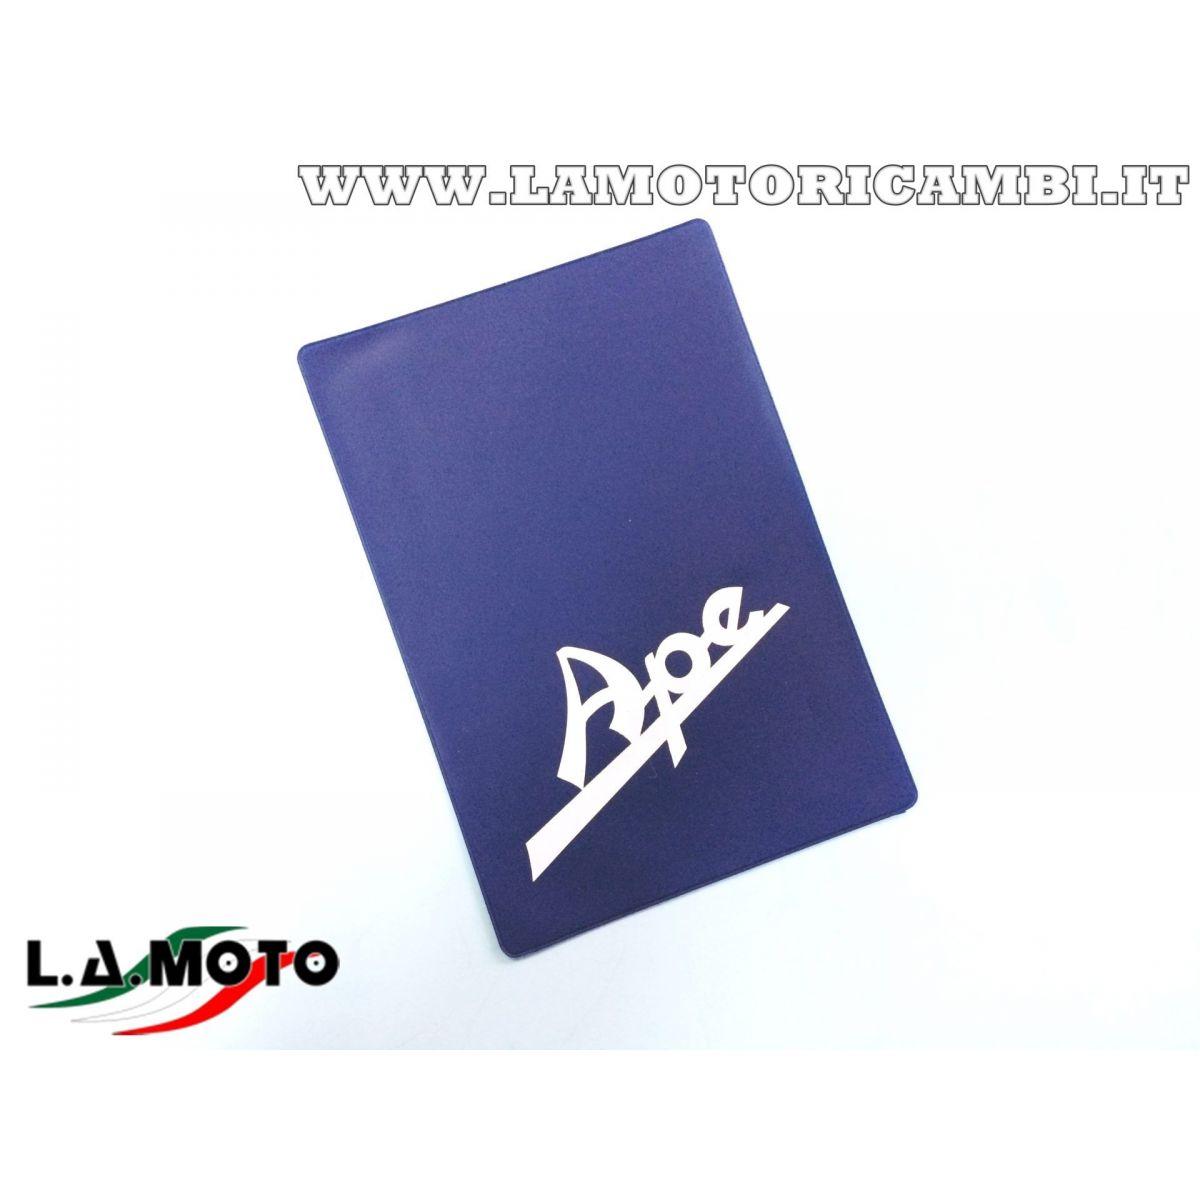 Porta documenti vintage per PIAGGIO APE MP CAR FL FL2 FL3 P MIX TM P CALESSINO A1 A11 AB AC MAX DIESEL POKER P601 P703